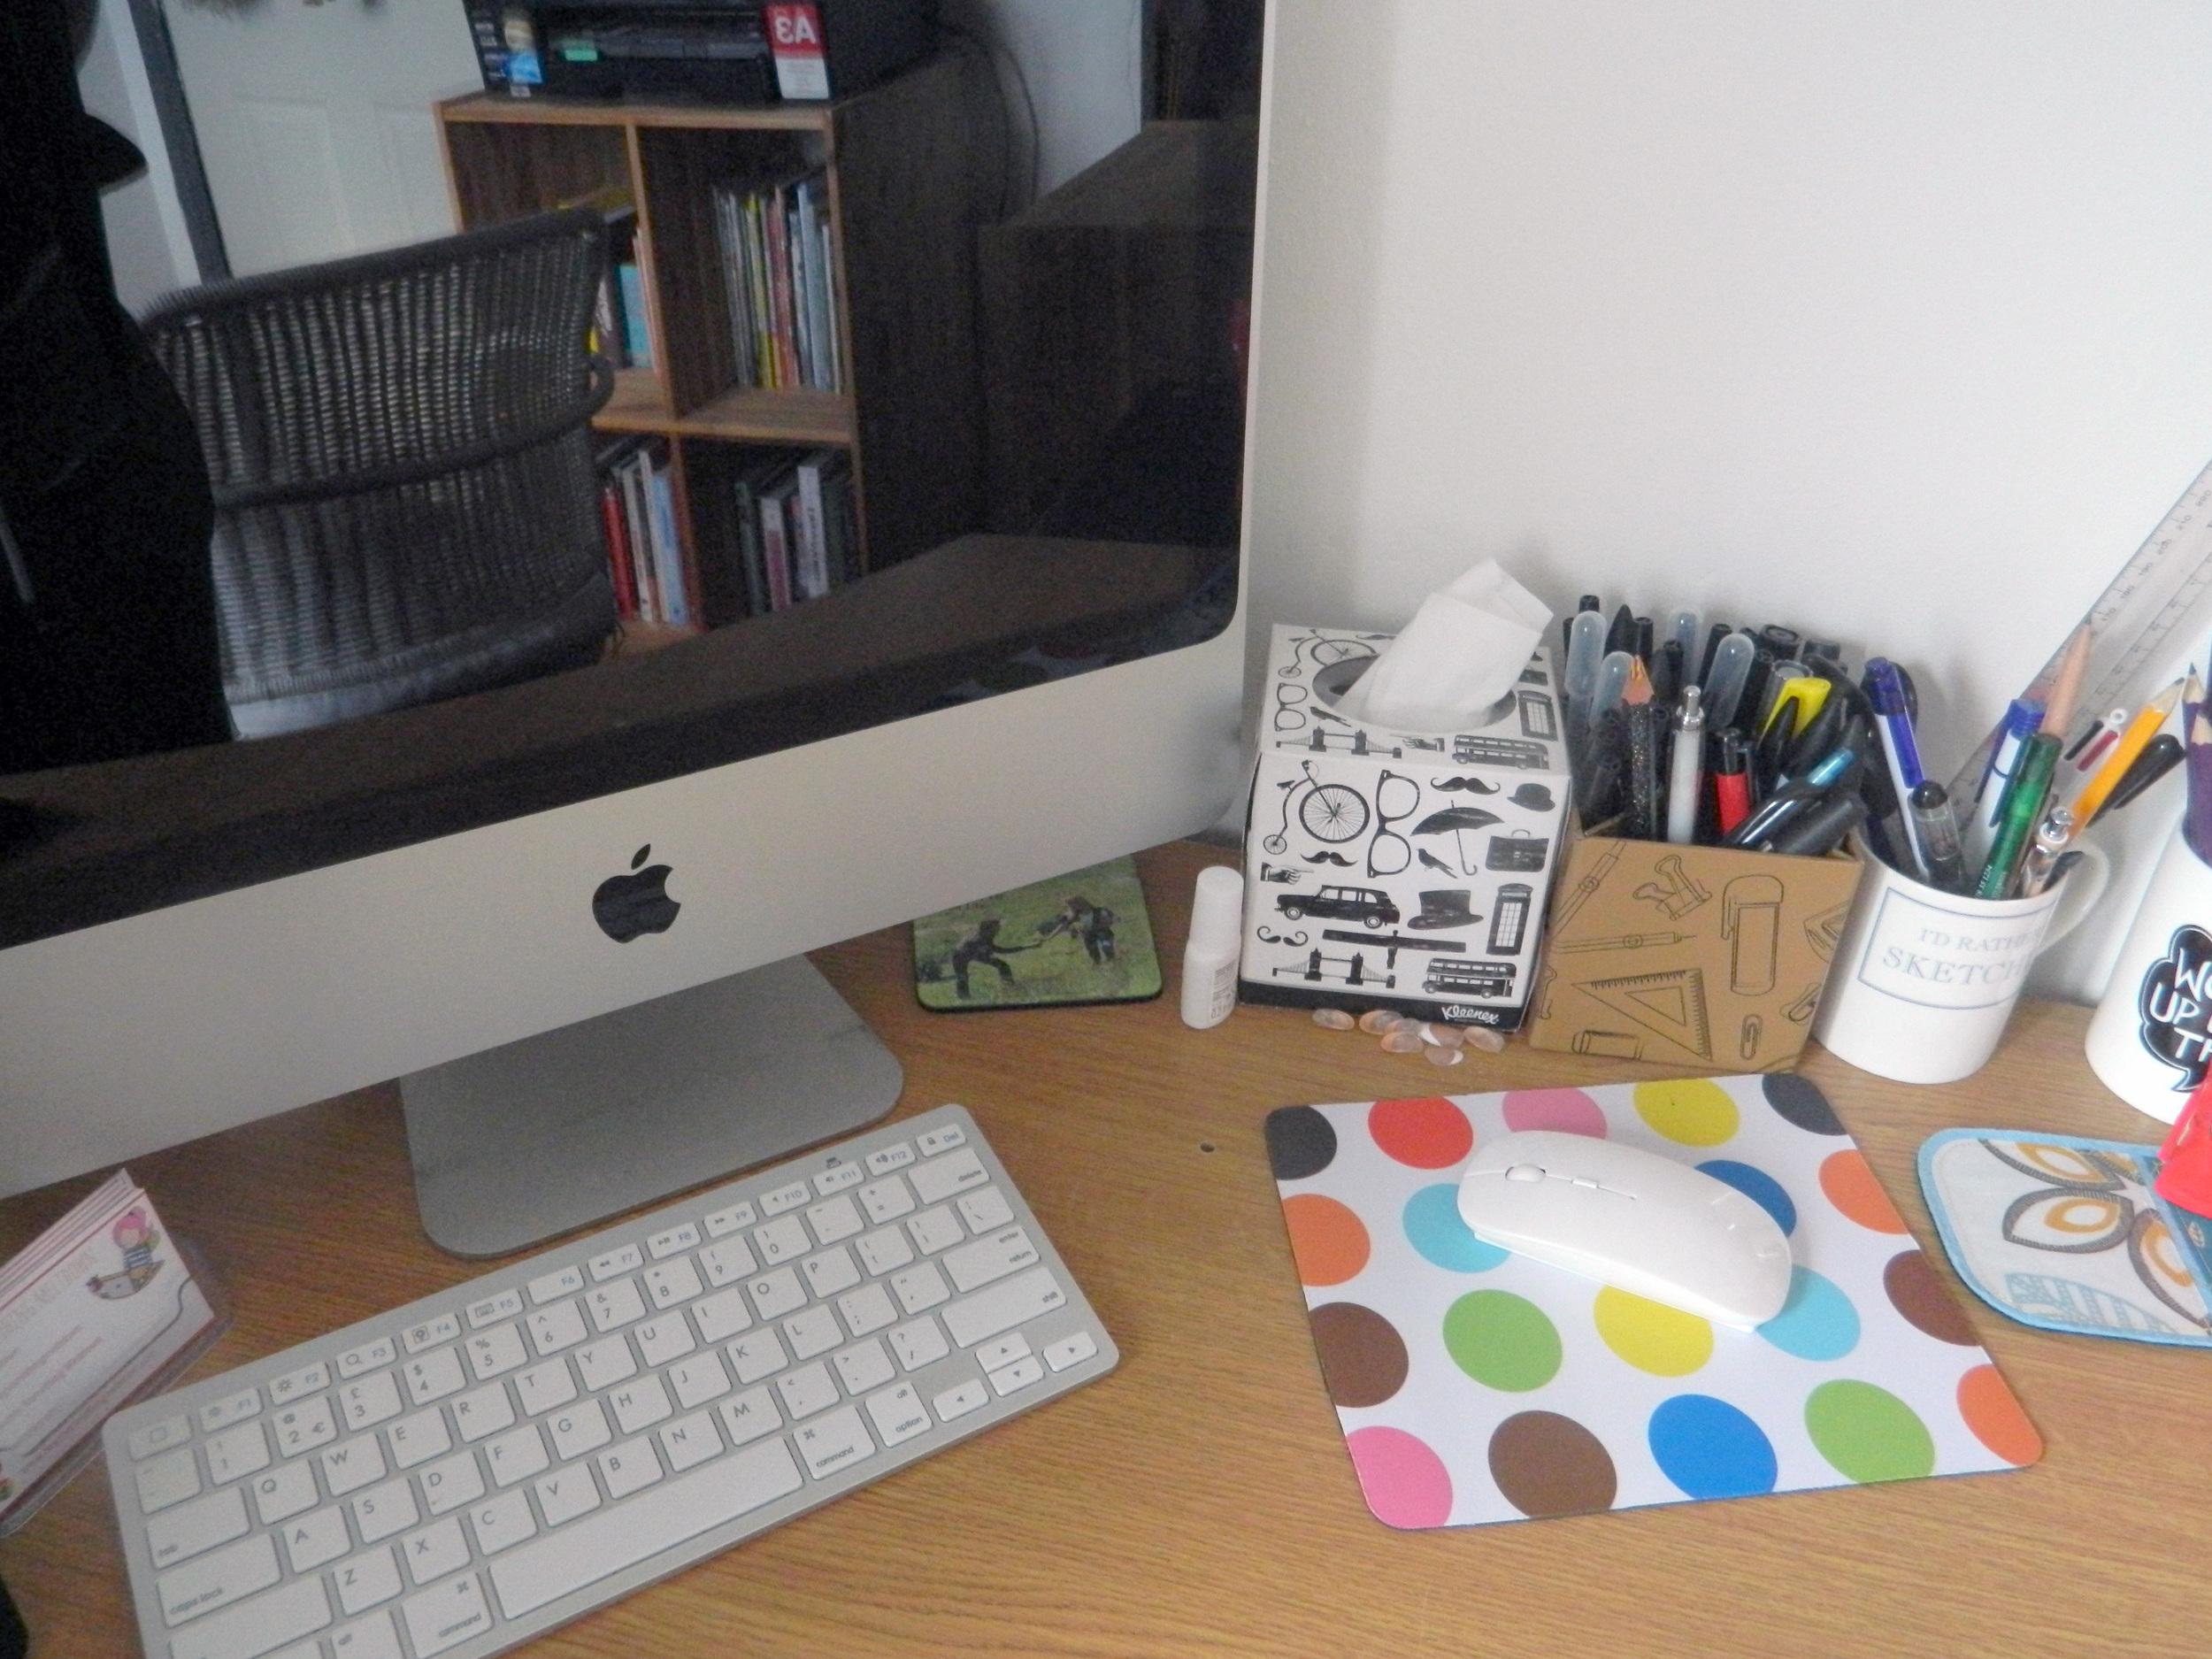 My desk/office.